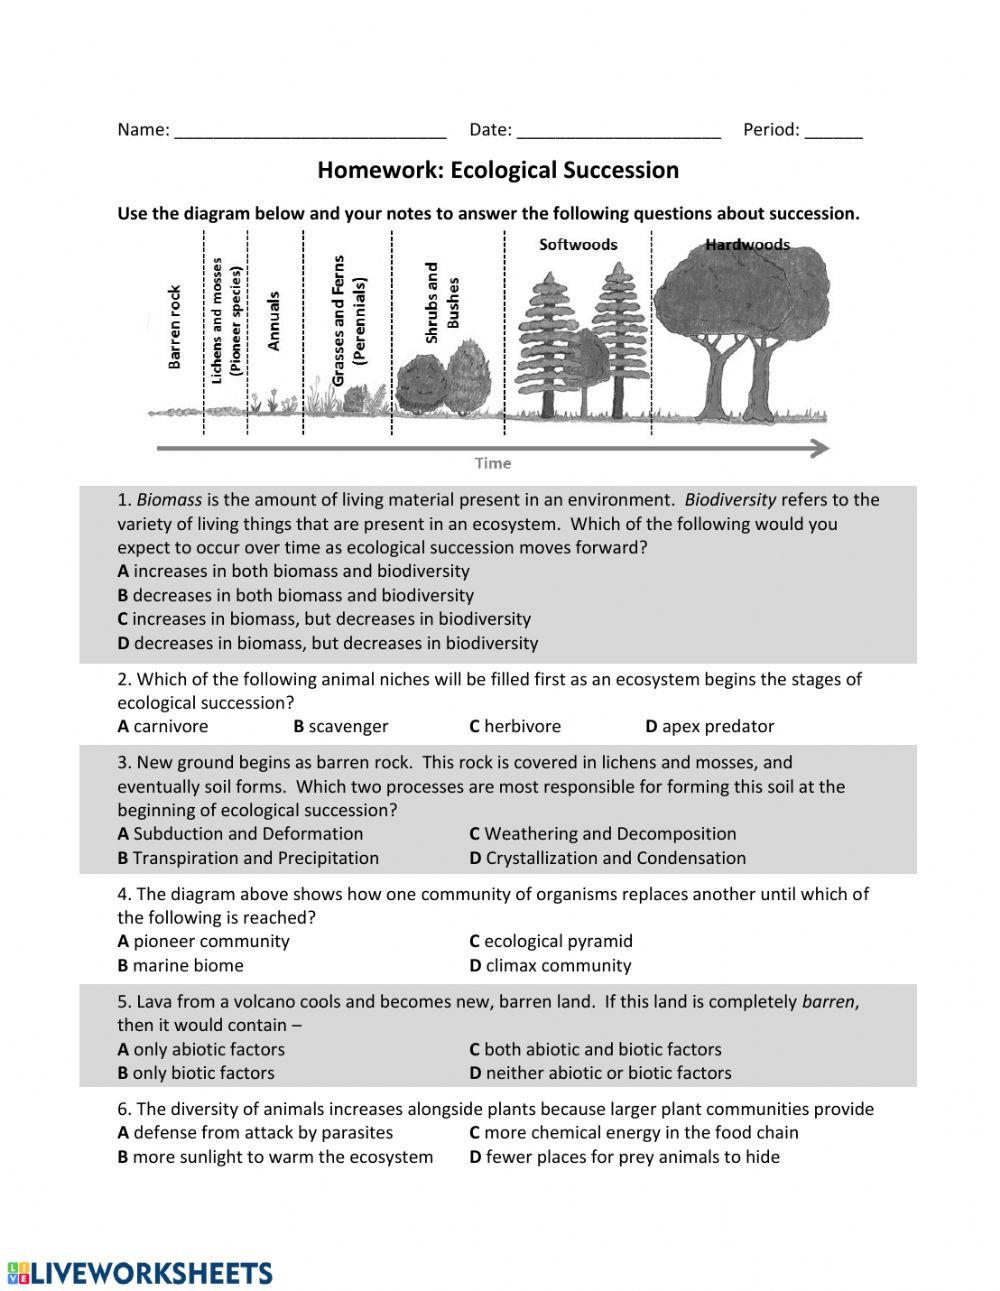 Abiotic and Biotic Factors Worksheet Es Ecological Succession Hw Interactive Worksheet